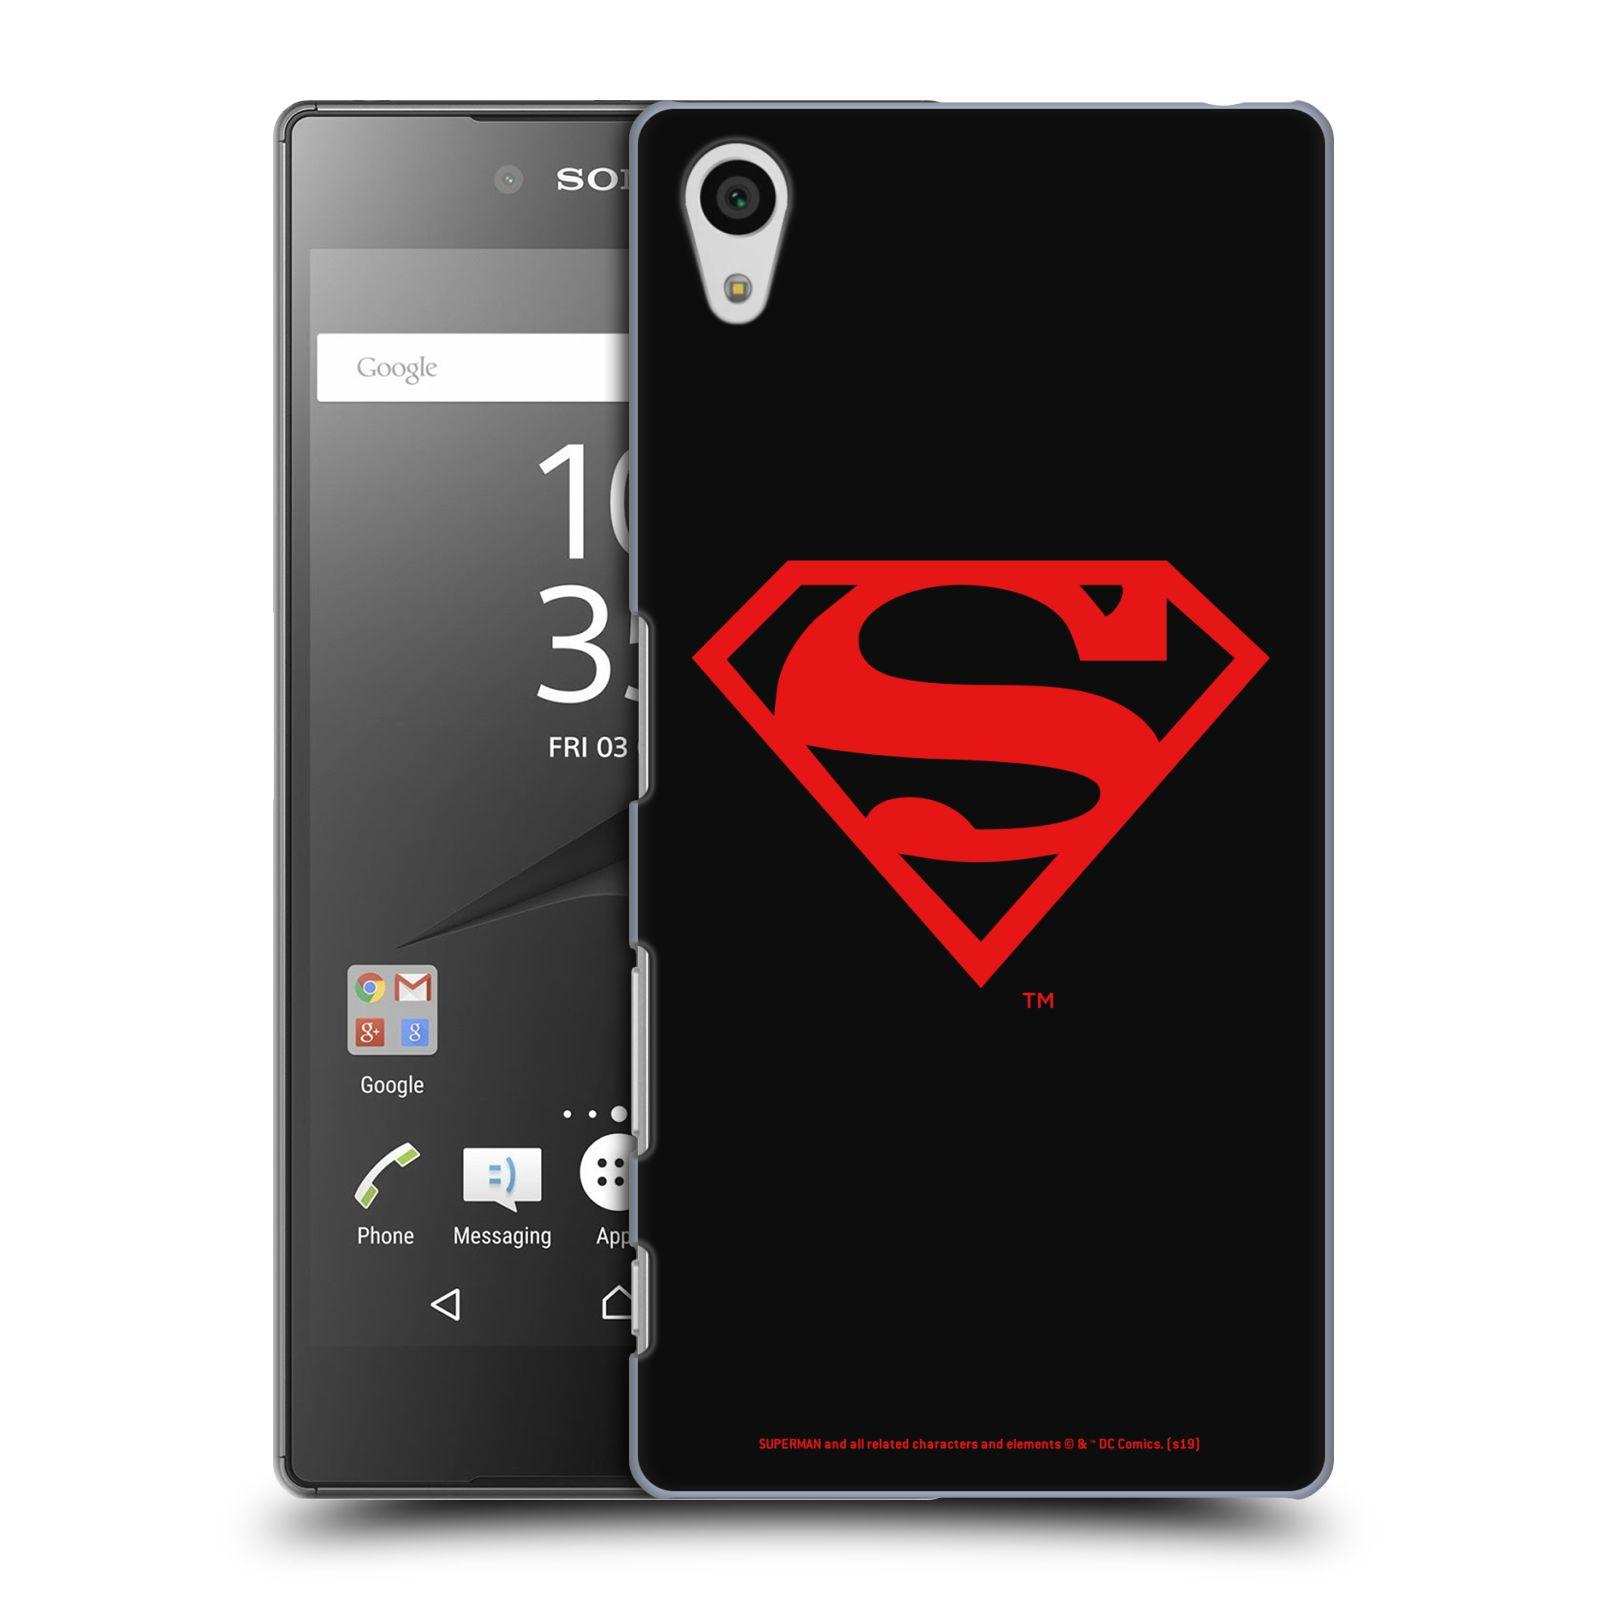 Pouzdro na mobil Sony Xperia Z5 - HEAD CASE - DC komix Superman červený znak černé pozadí